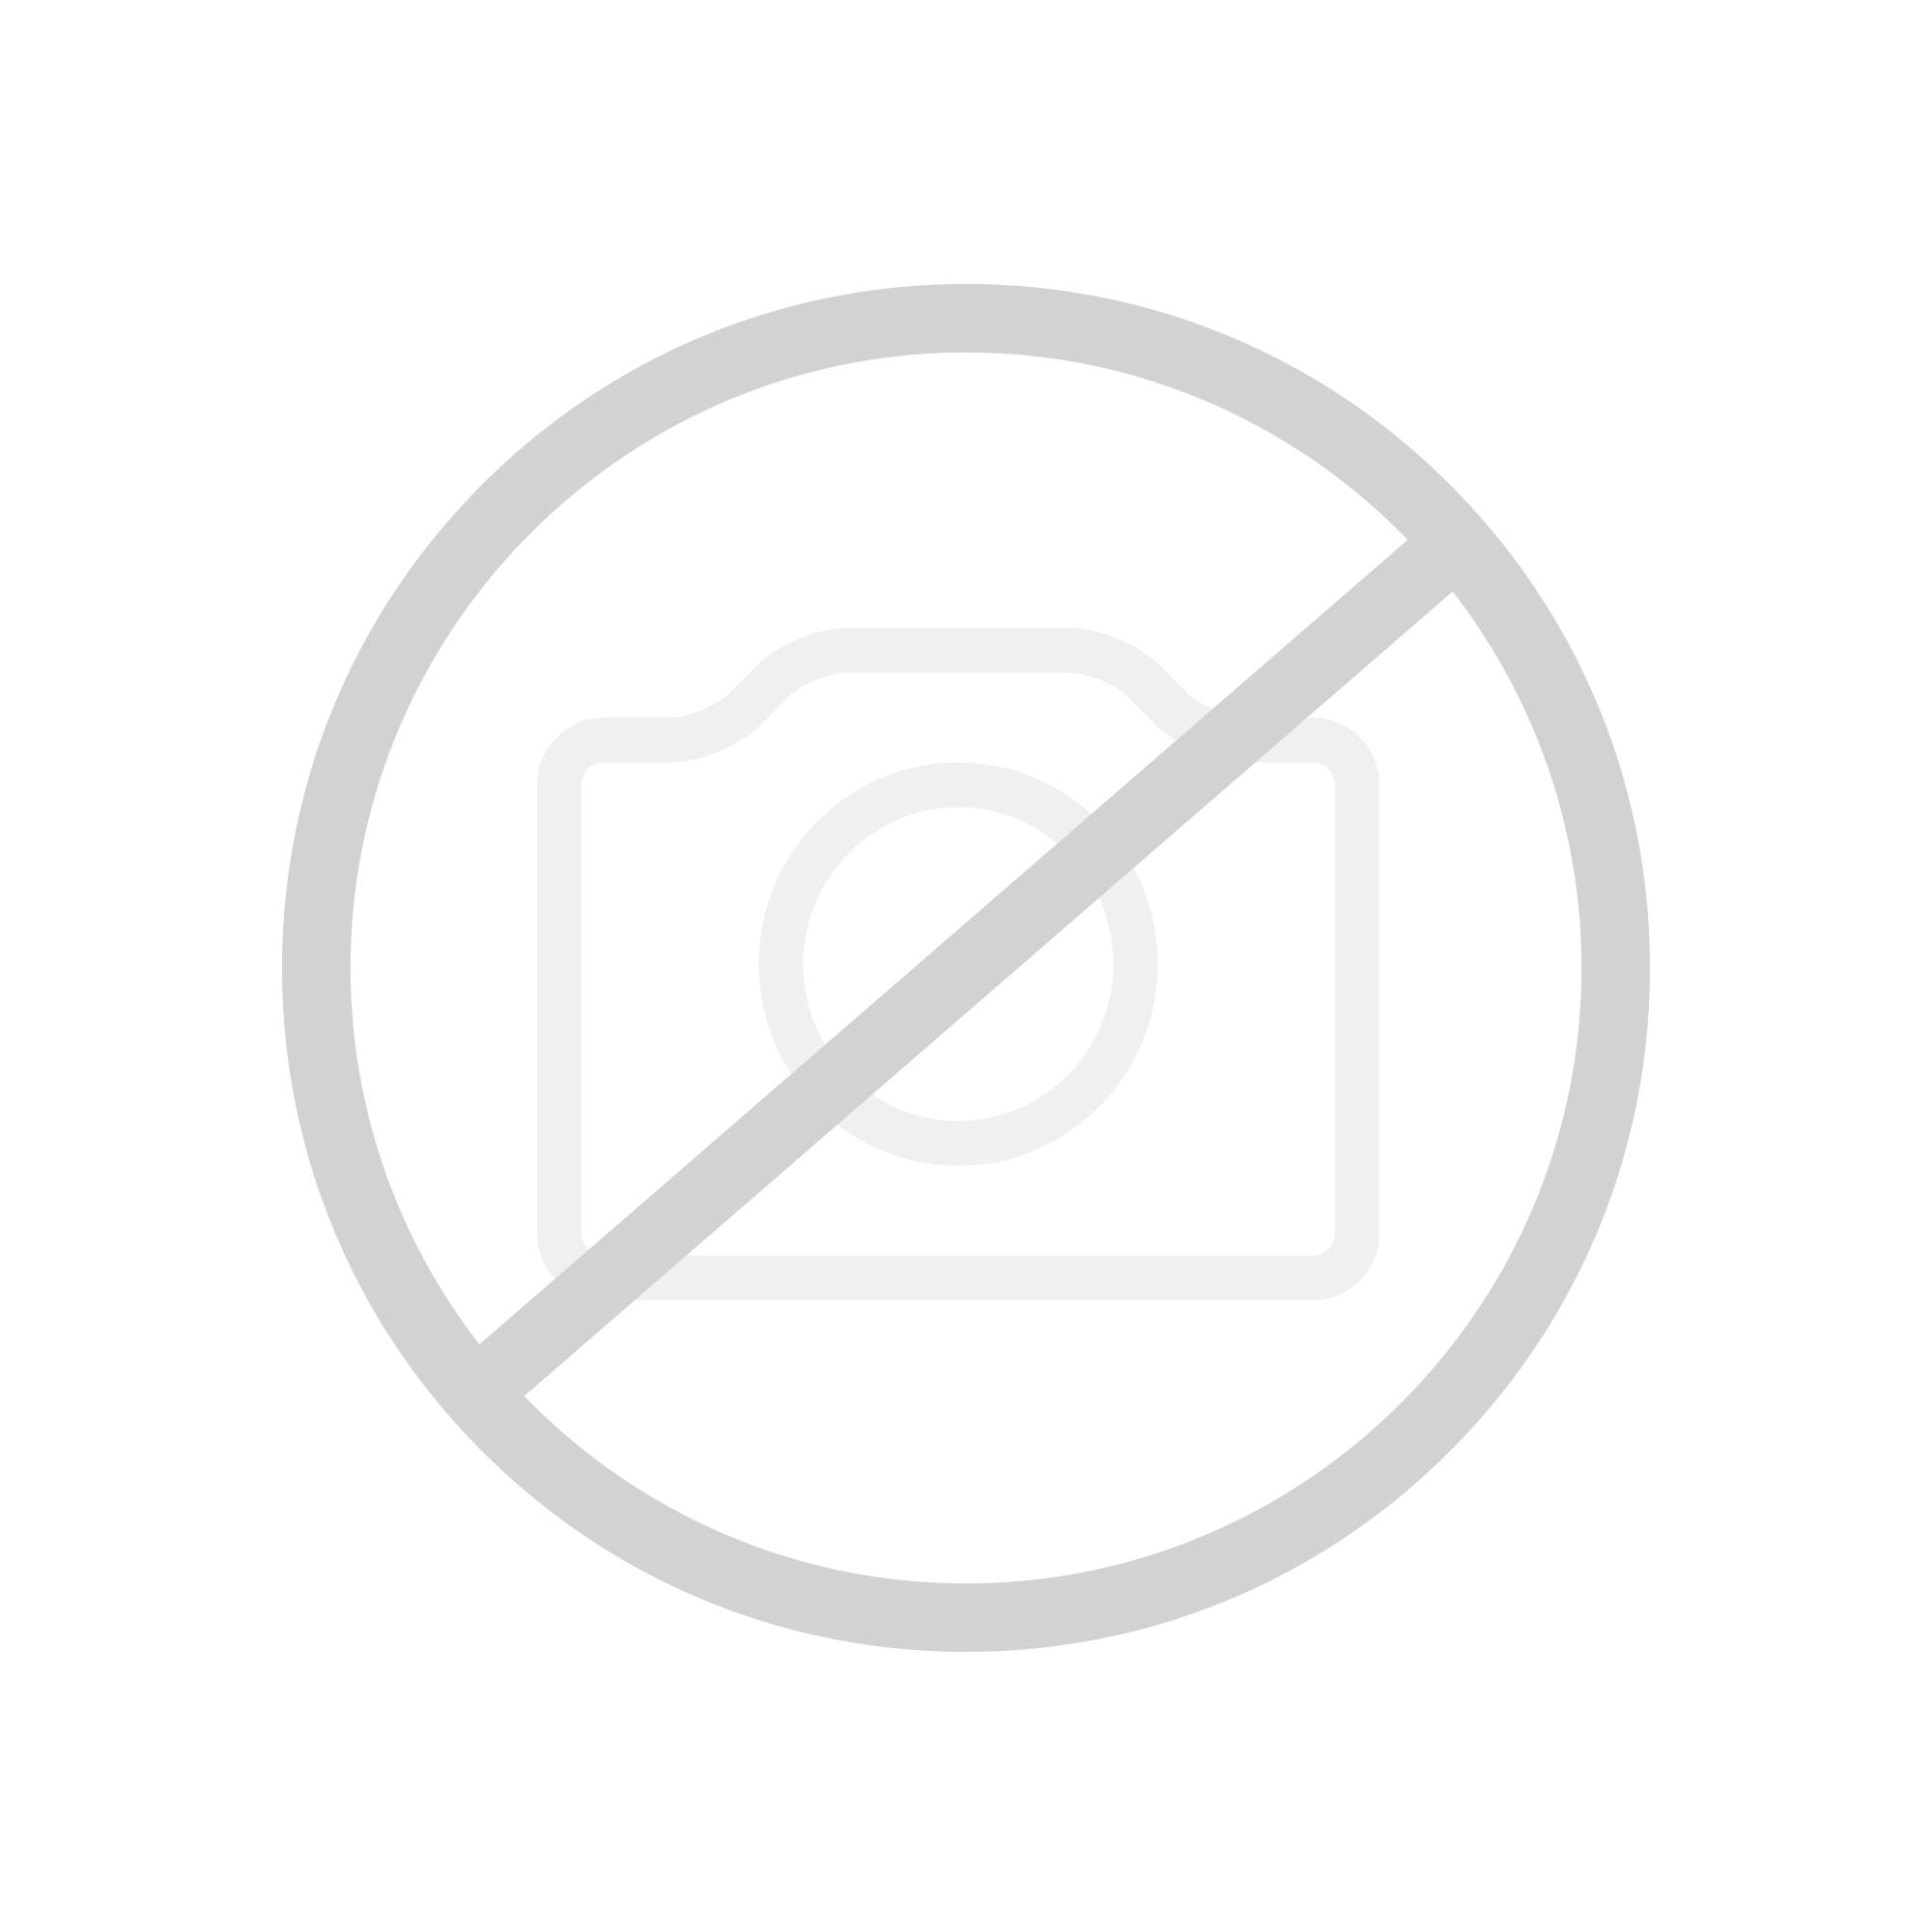 Keuco Moll Toilettenbürstengarnitur, Standmodell chrom/weiß